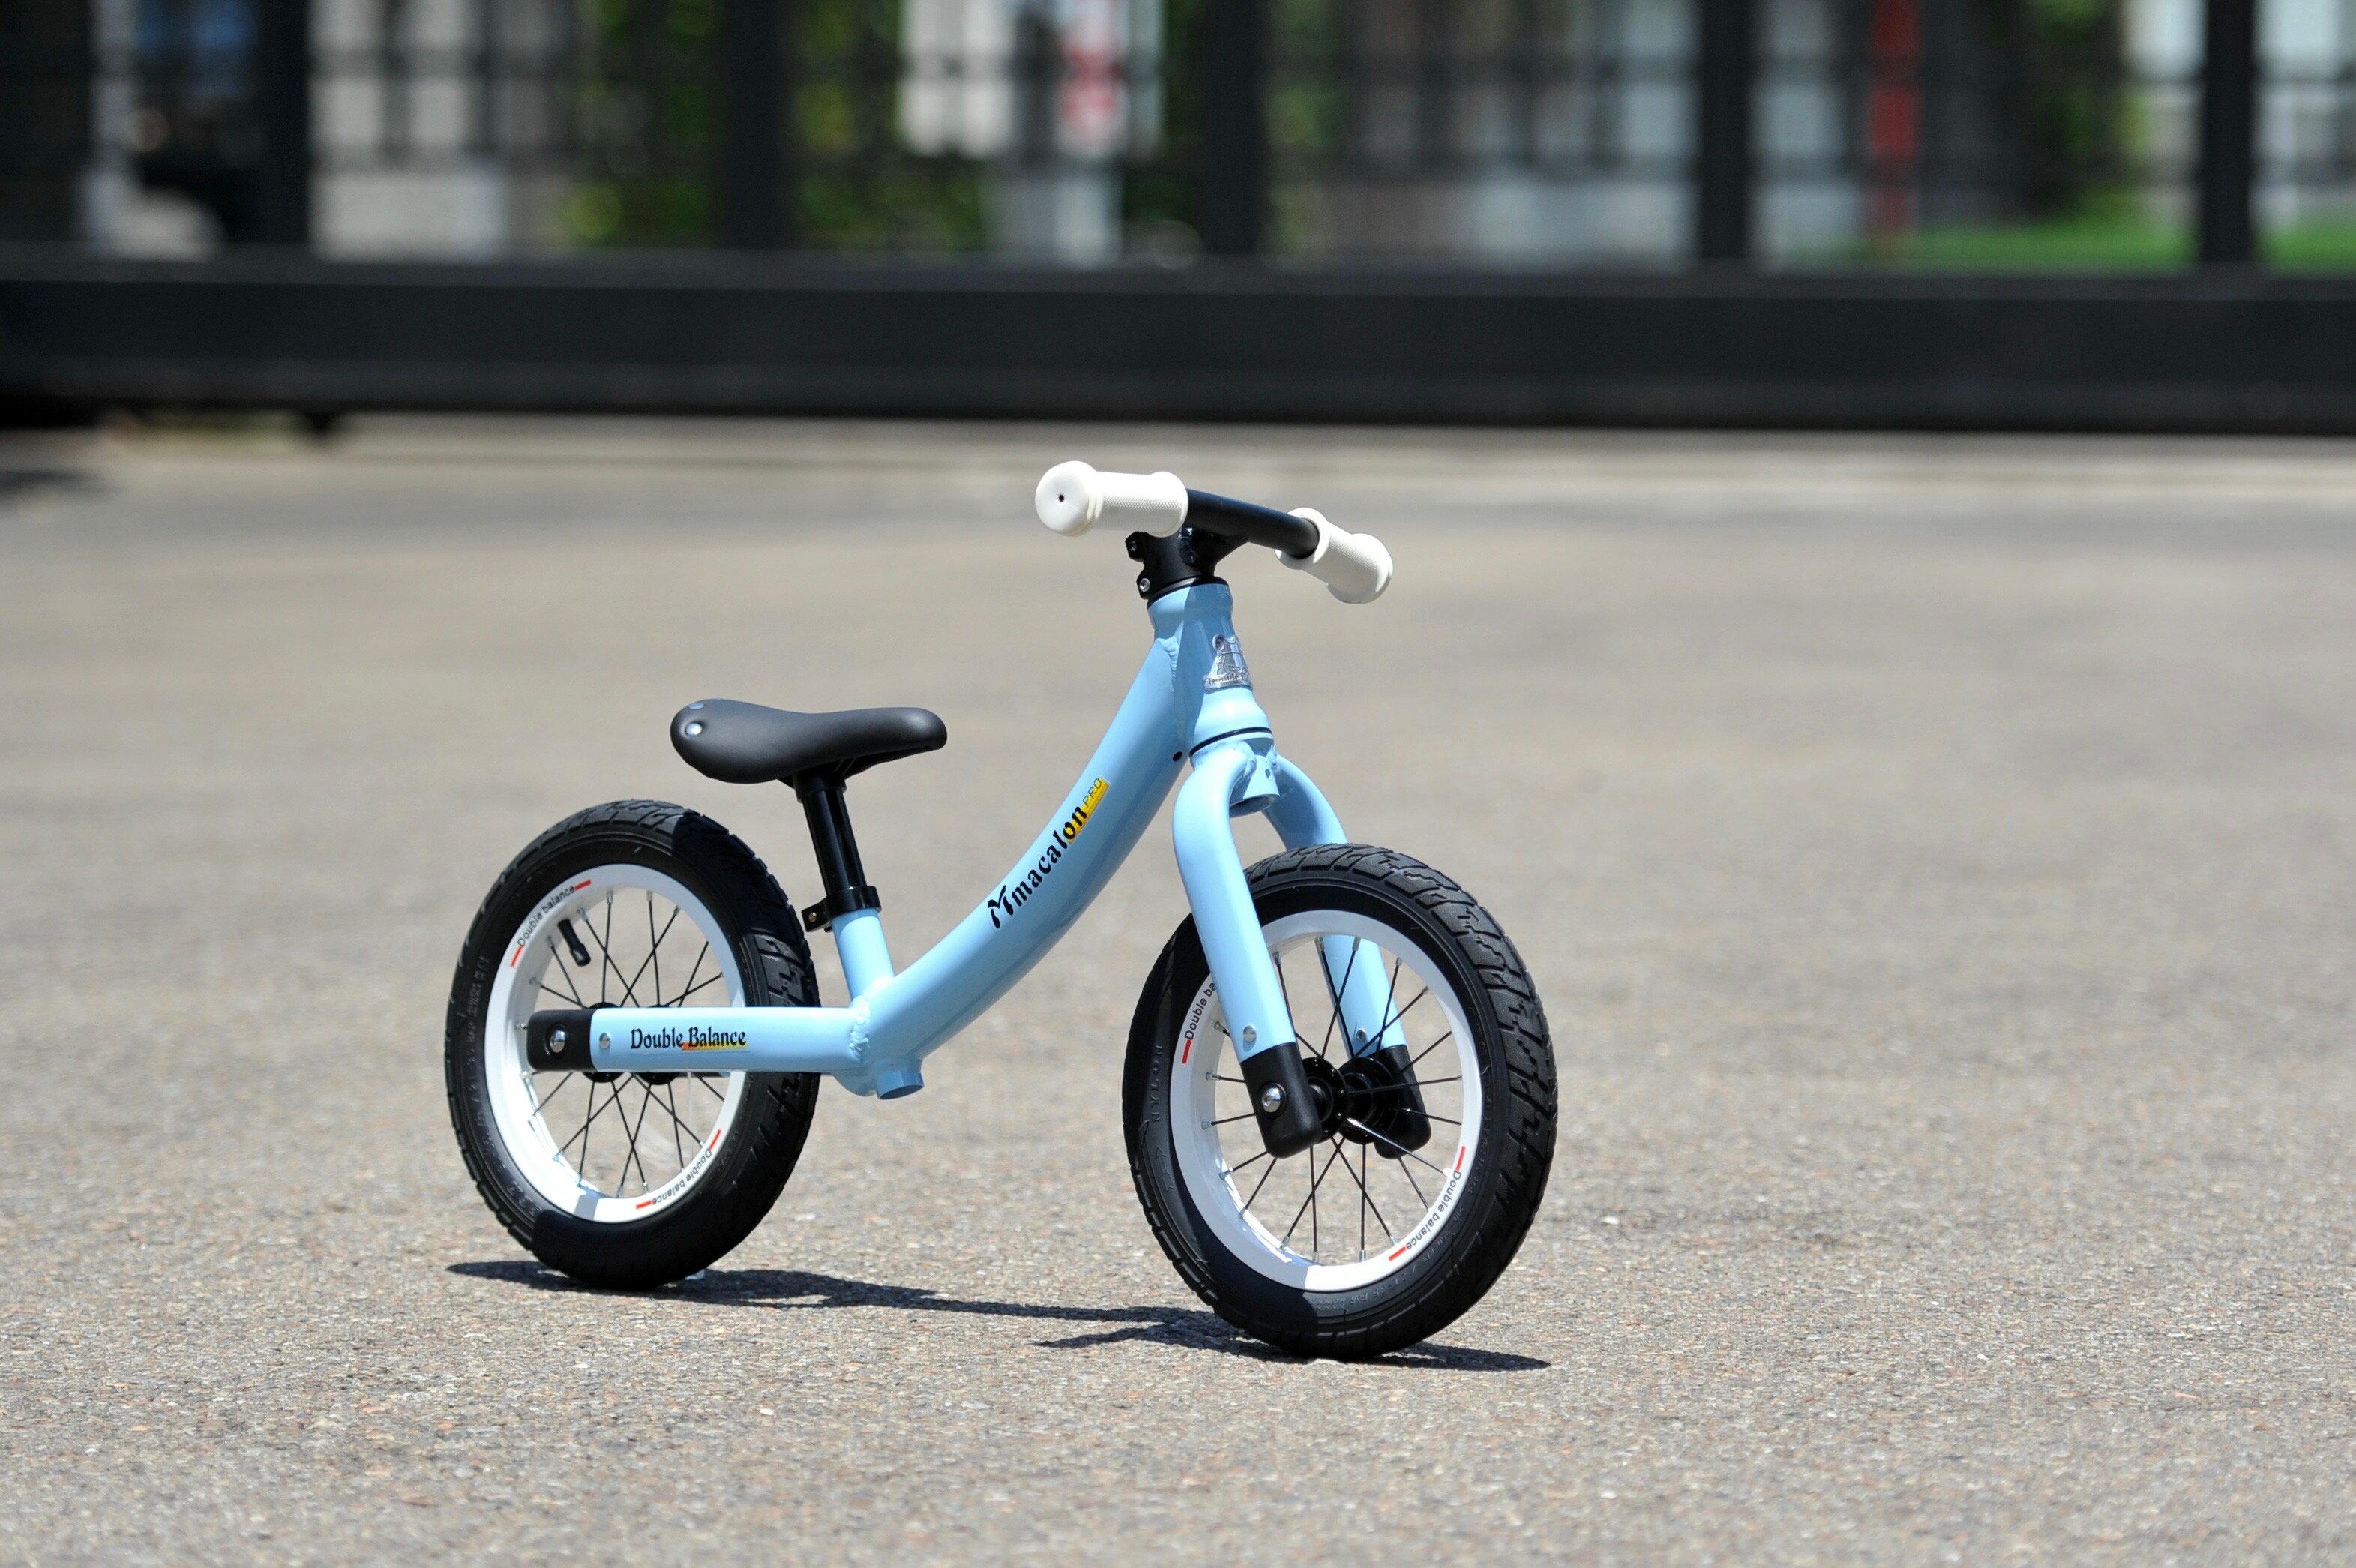 【Double Balance】 兒童滑步車 平衡車 馬卡龍 藍色/白色烤漆鋁框充氣輪 MIT台灣製造 KMA-23 (共四色)低跨點3.2KG